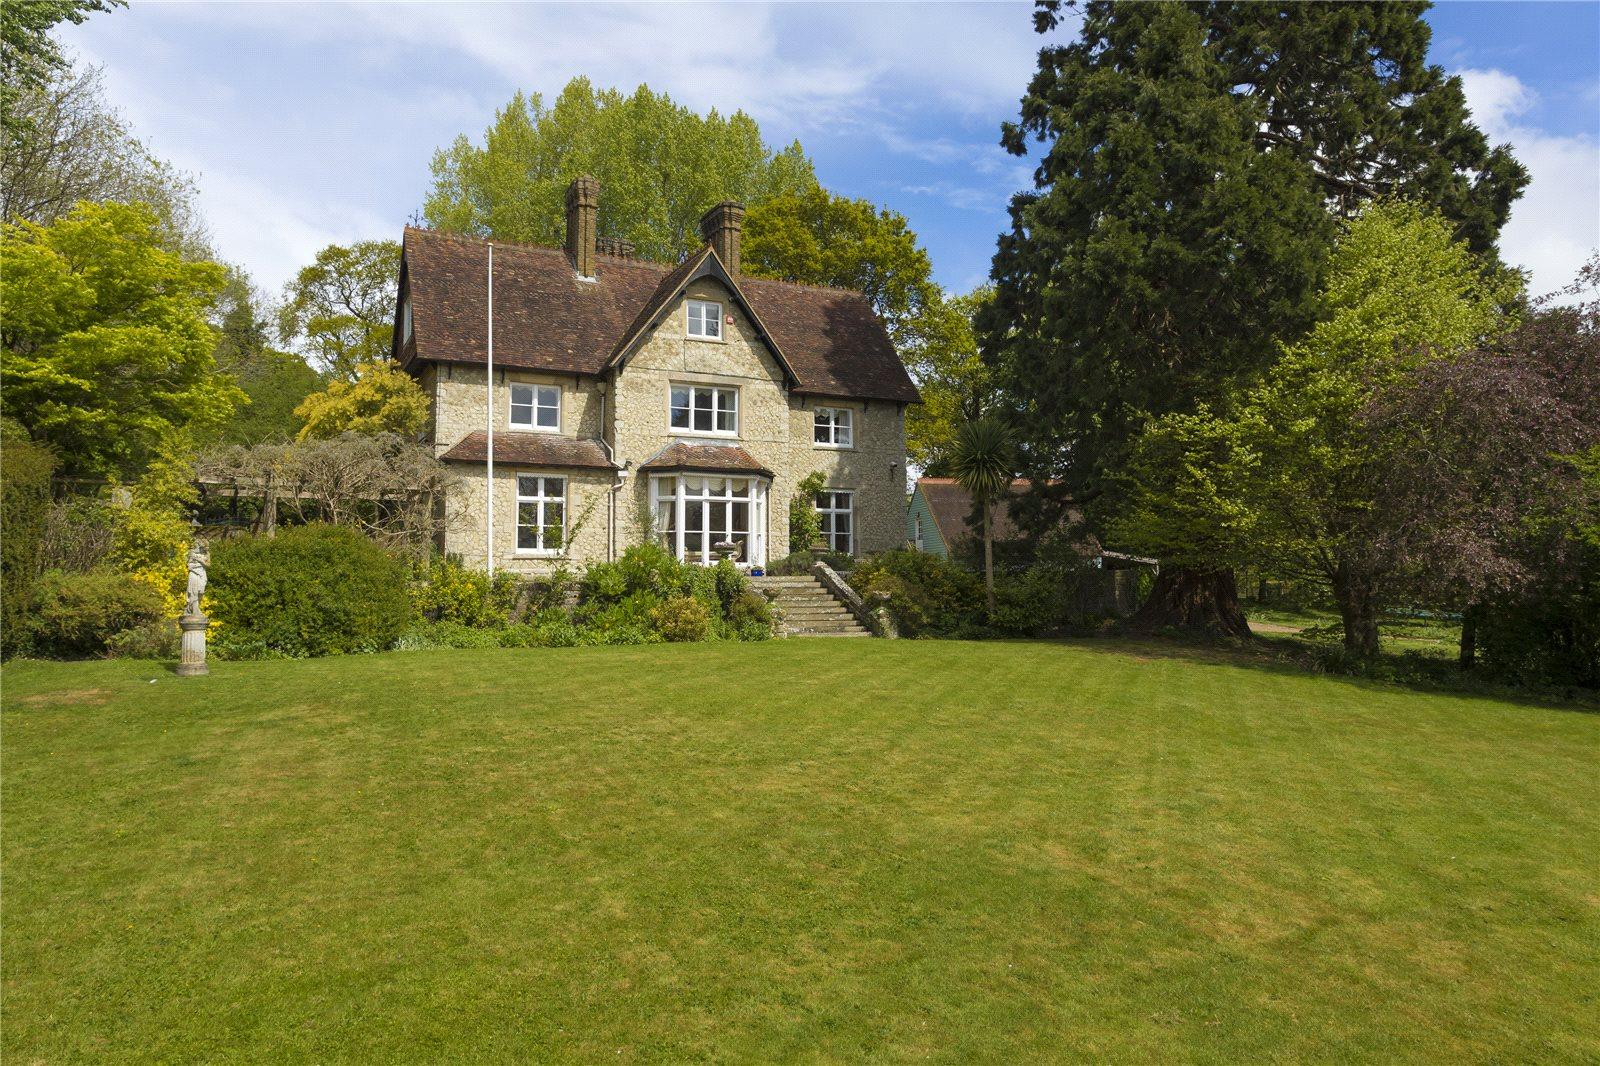 Casa para uma família para Venda às Church Hill, Boughton Monchelsea, Maidstone, Kent, ME17 Maidstone, Inglaterra